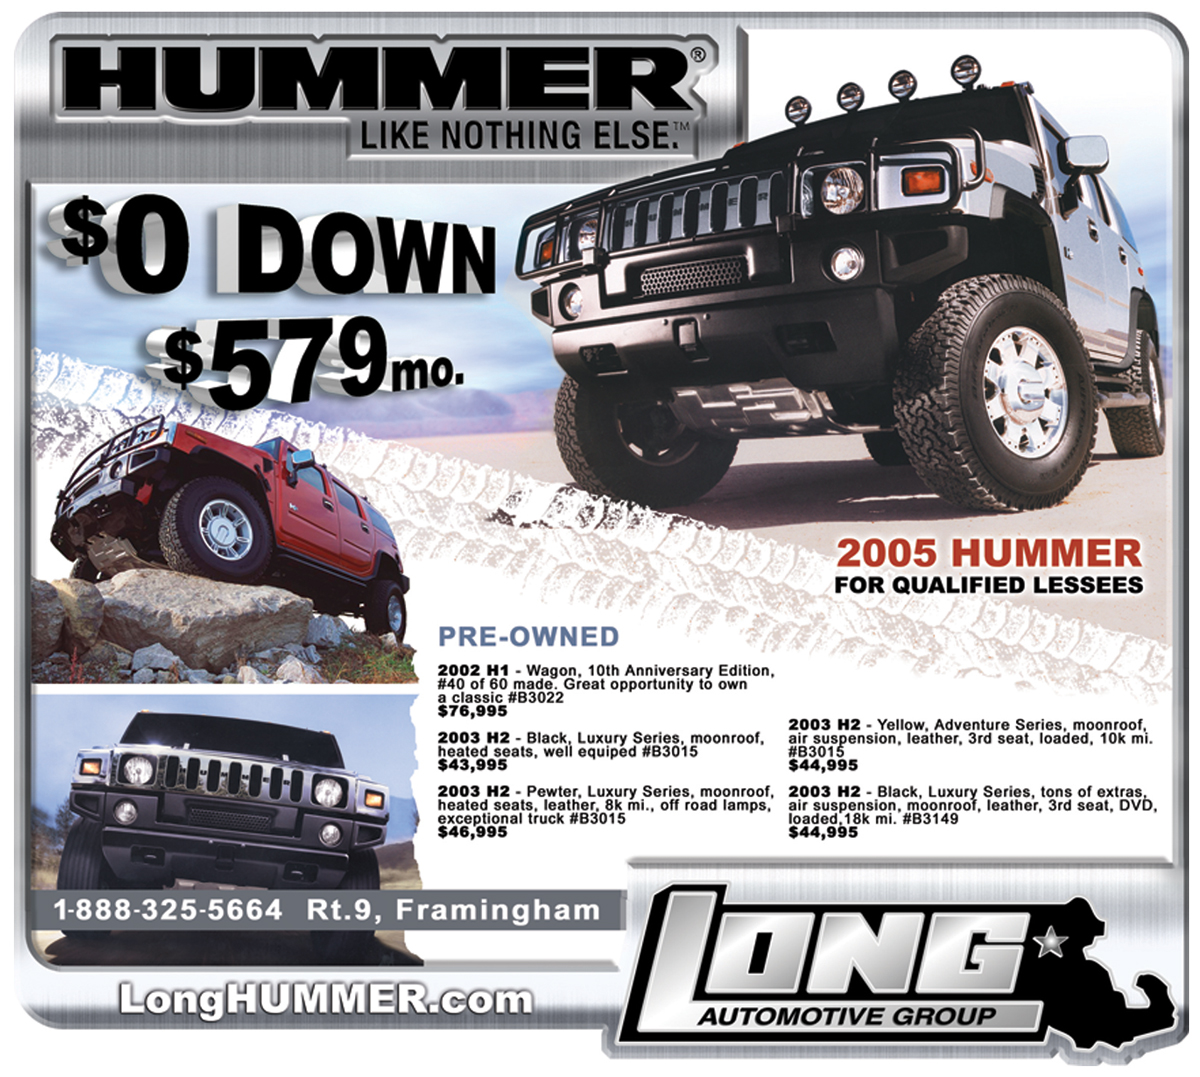 Long Hummer